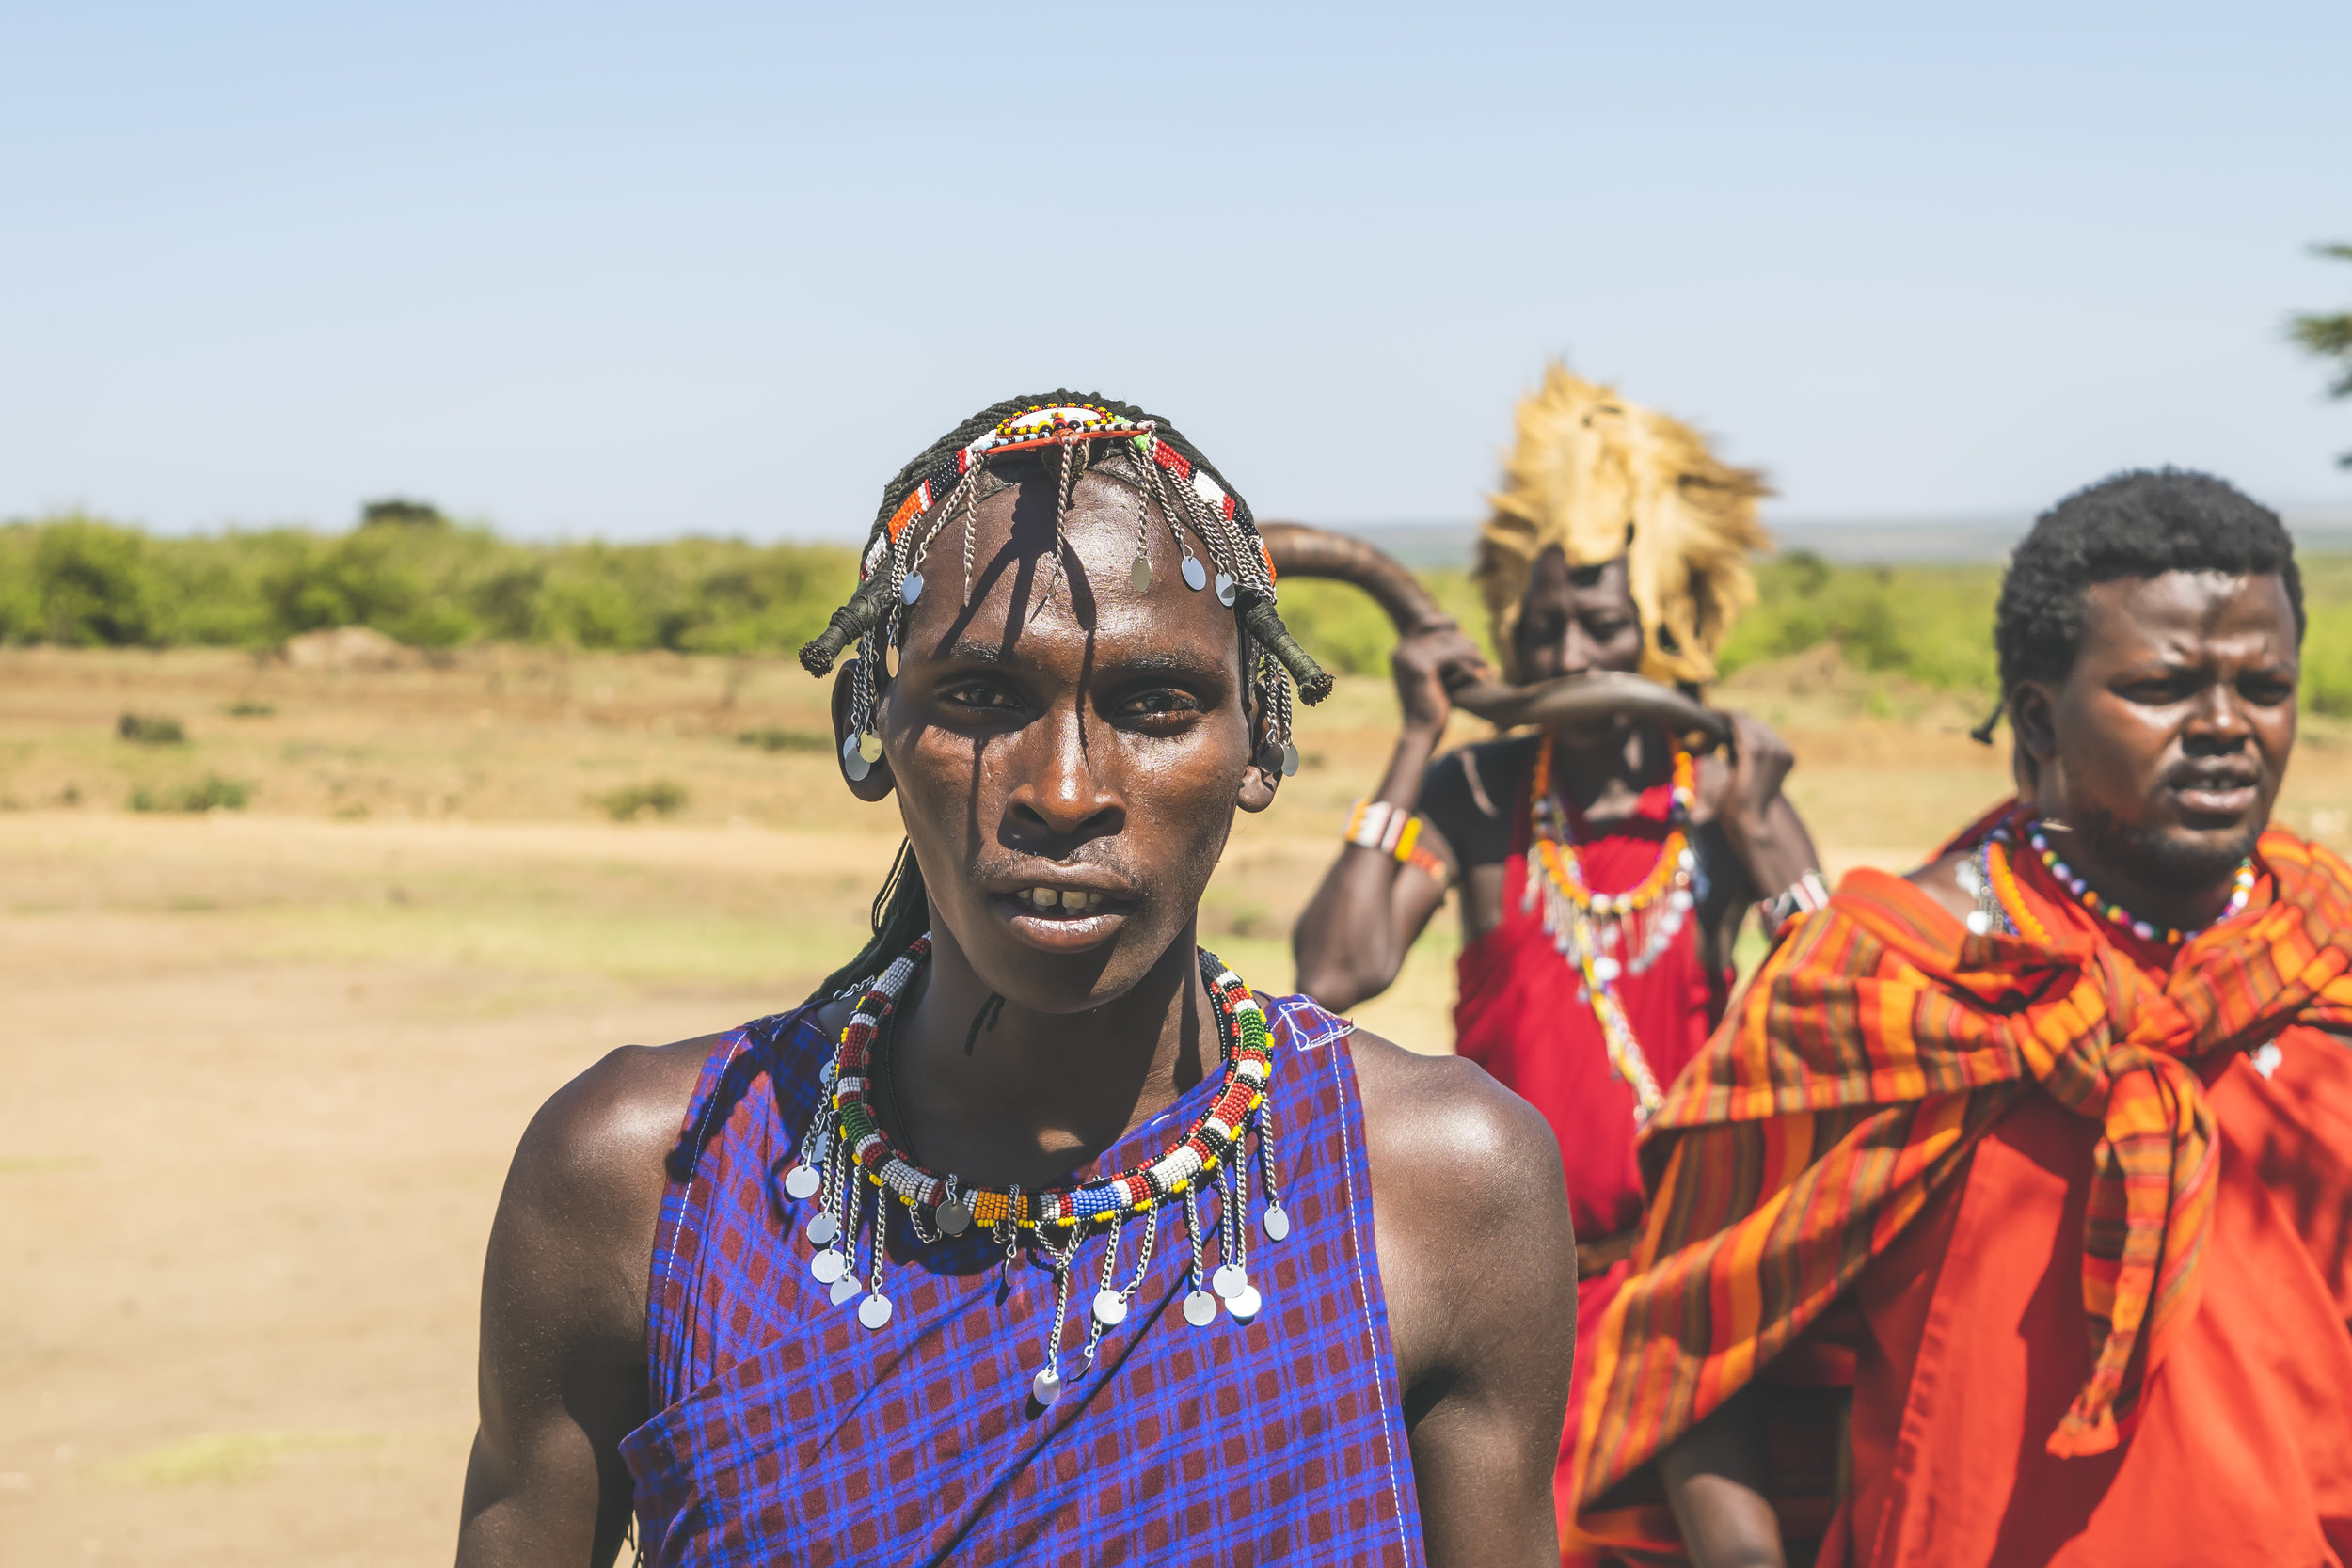 Maasai02.jpg